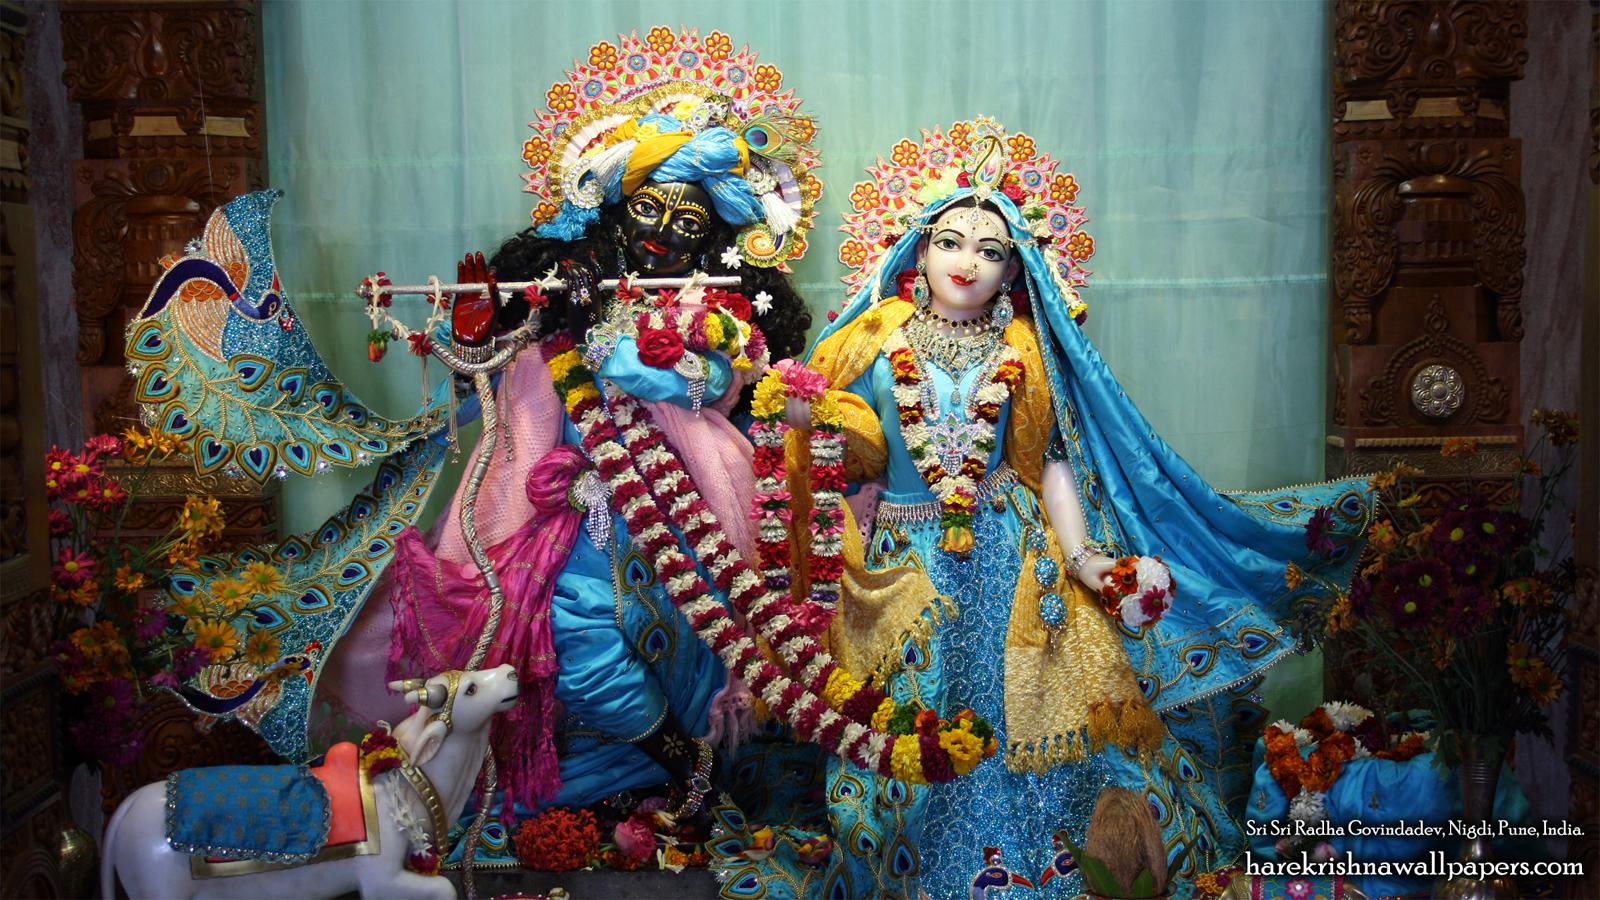 Sri Sri Radha Govind Wallpaper (032) Size 1600x900 Download